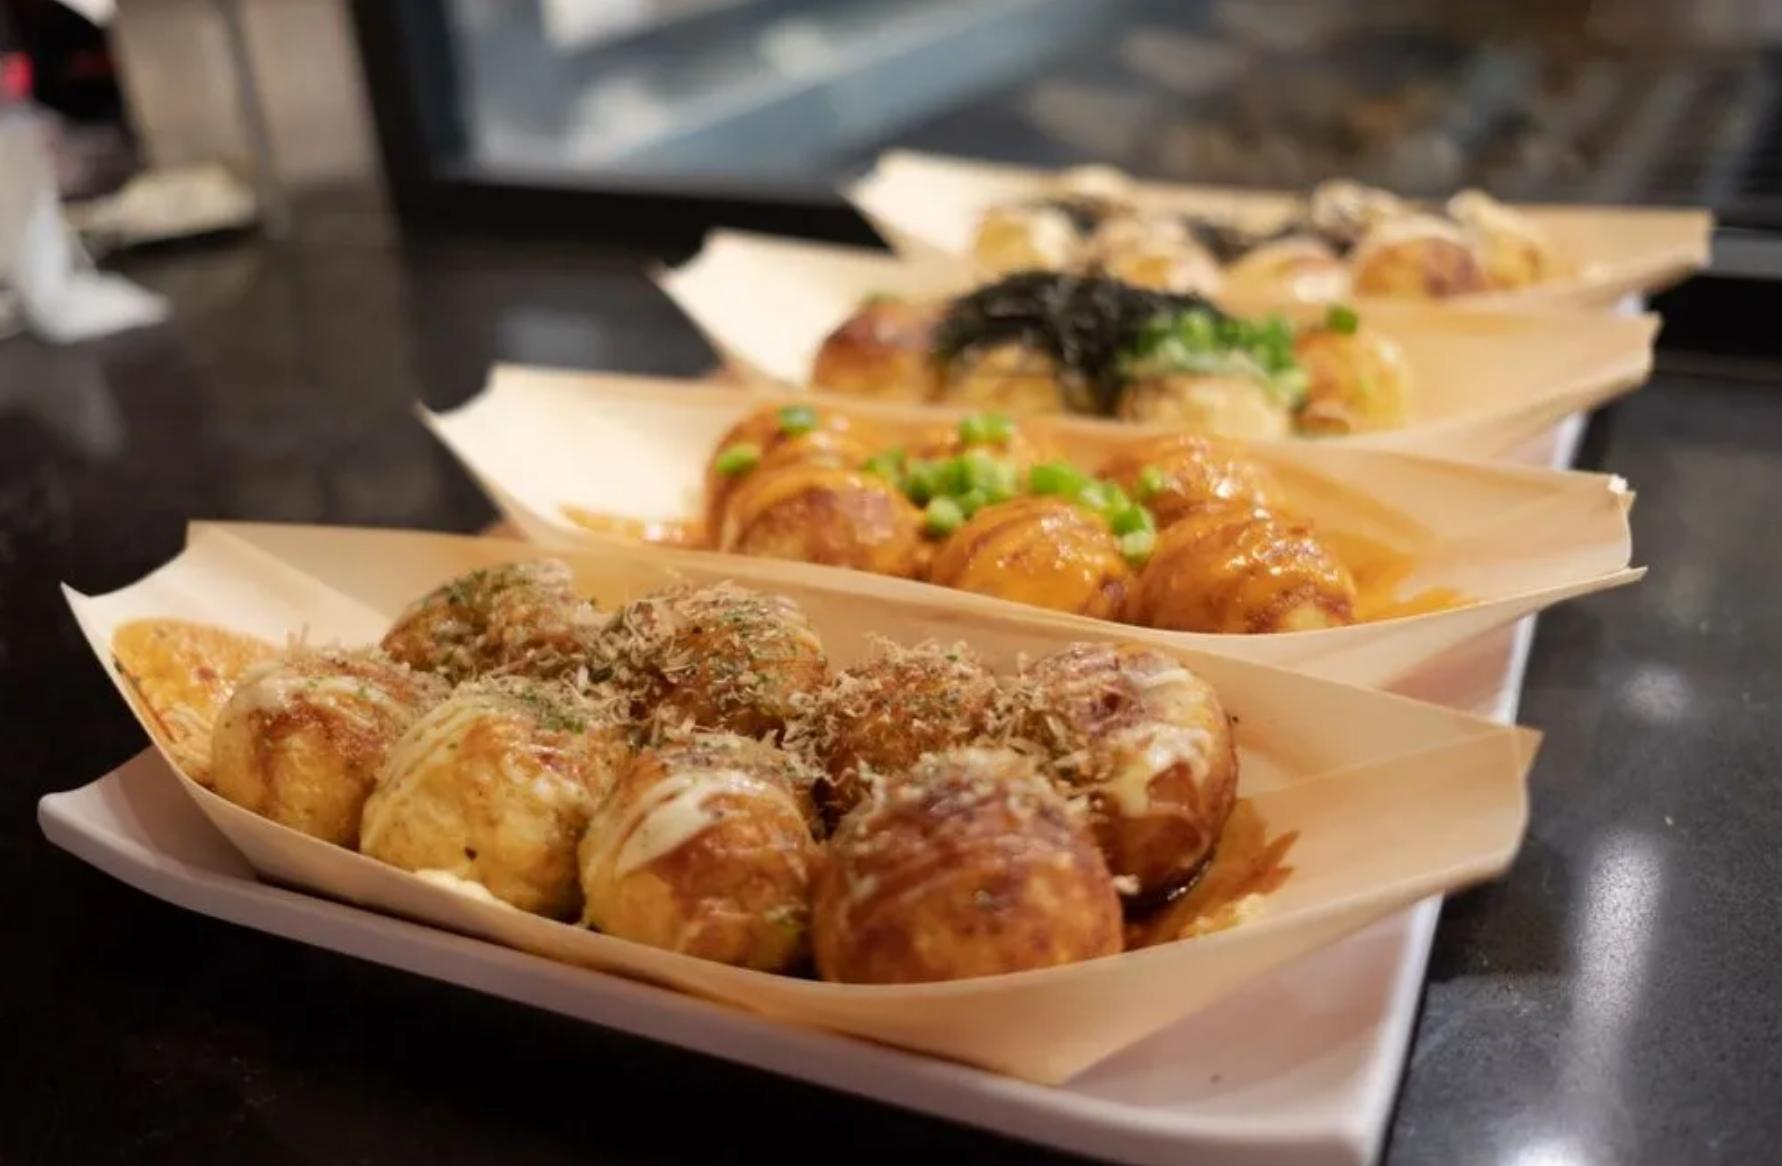 Three takoyaki dishes